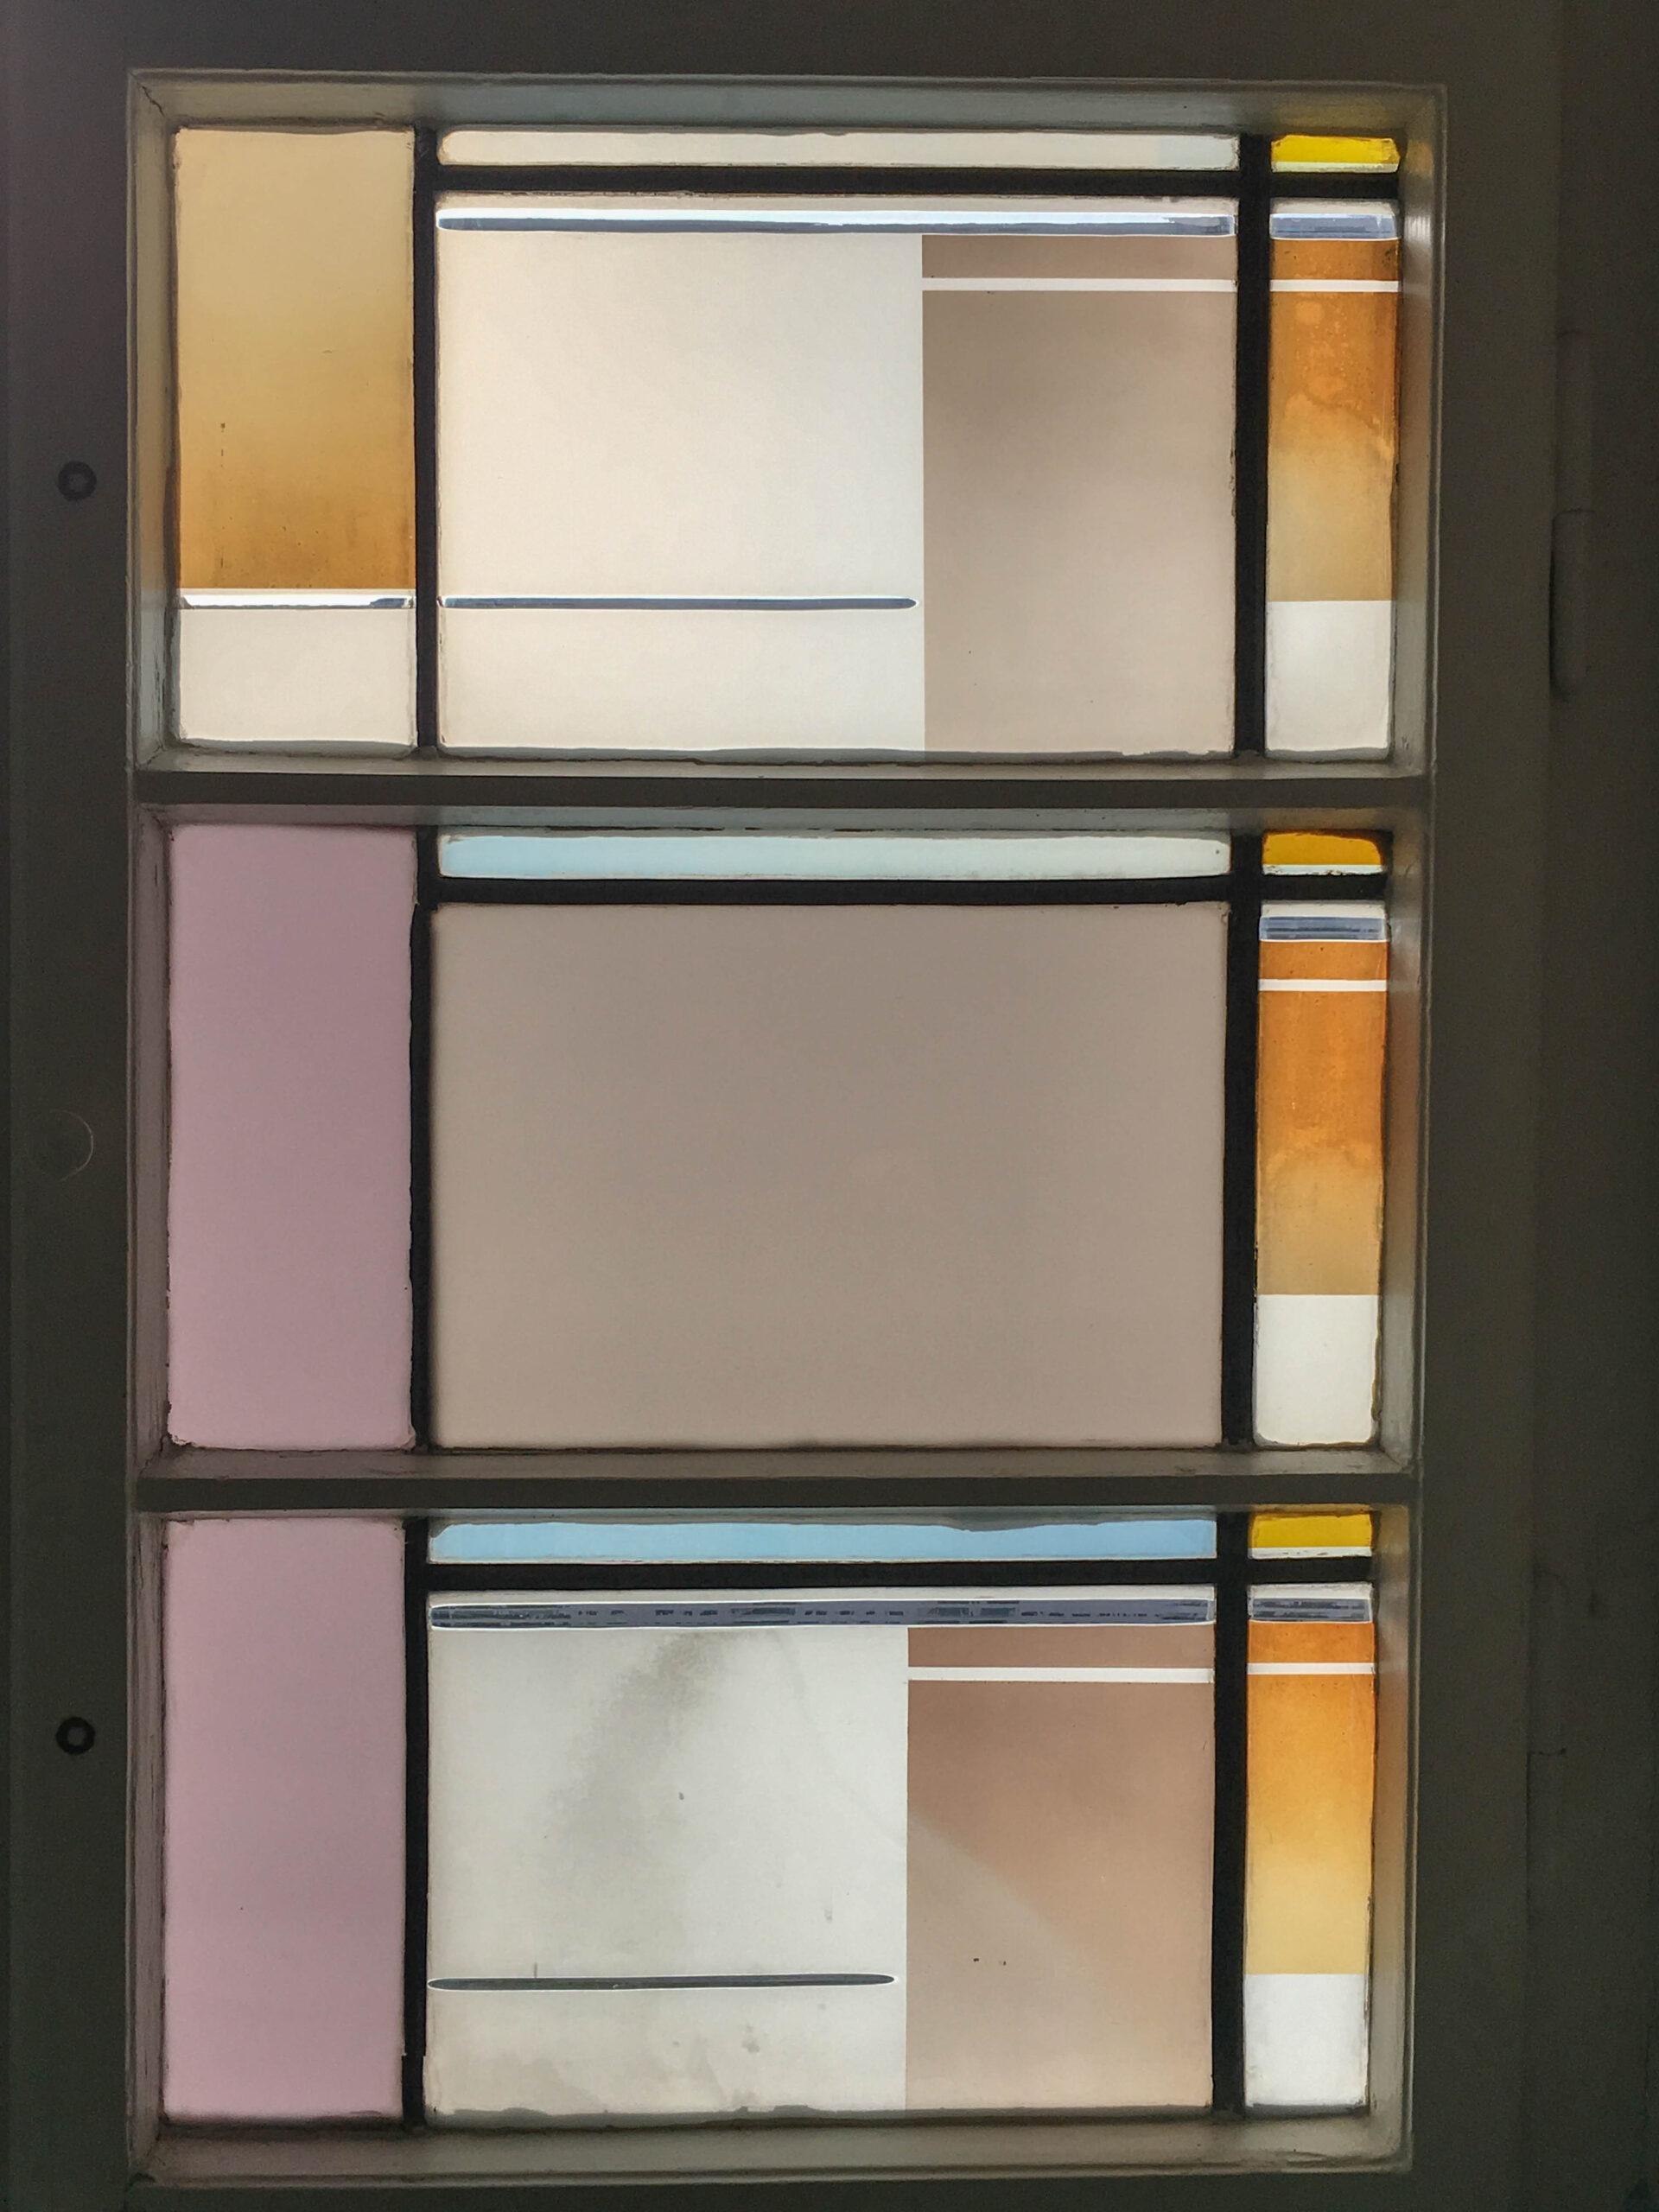 Femina-Palast, 1928-1931. Architekten: Richard Bielenberg, Josef Moser